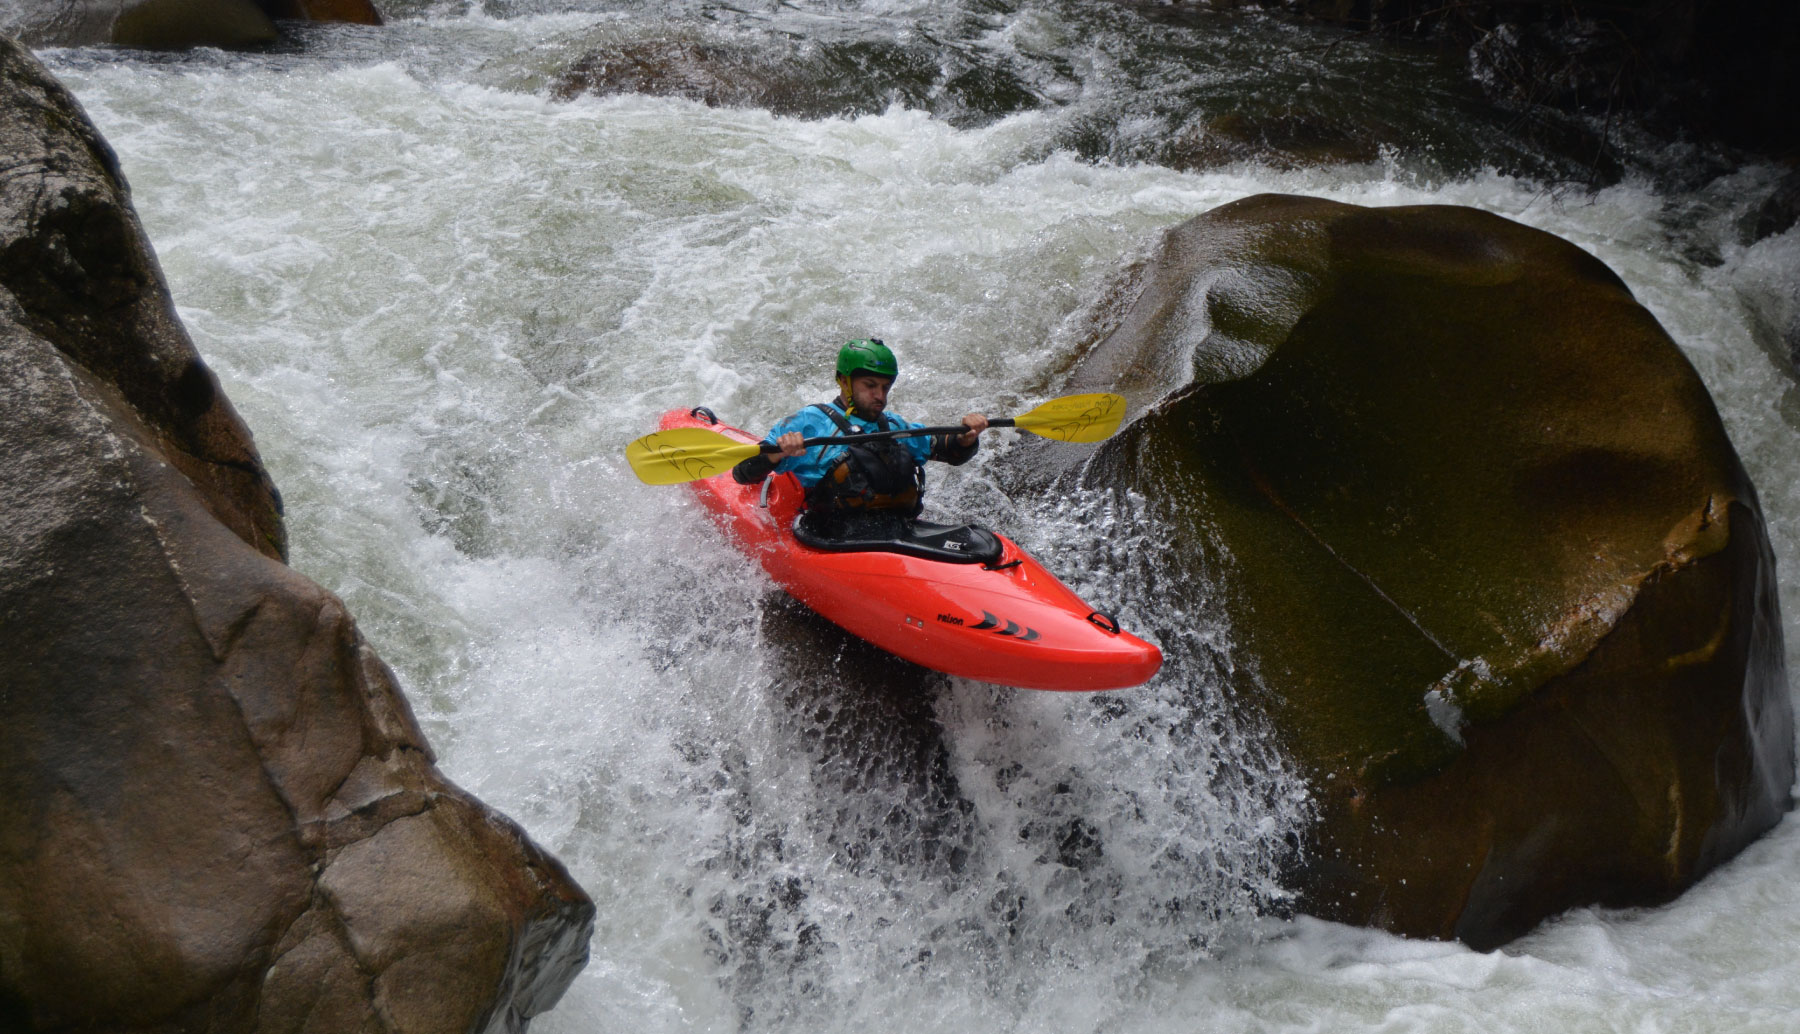 Kayaking guide descending river